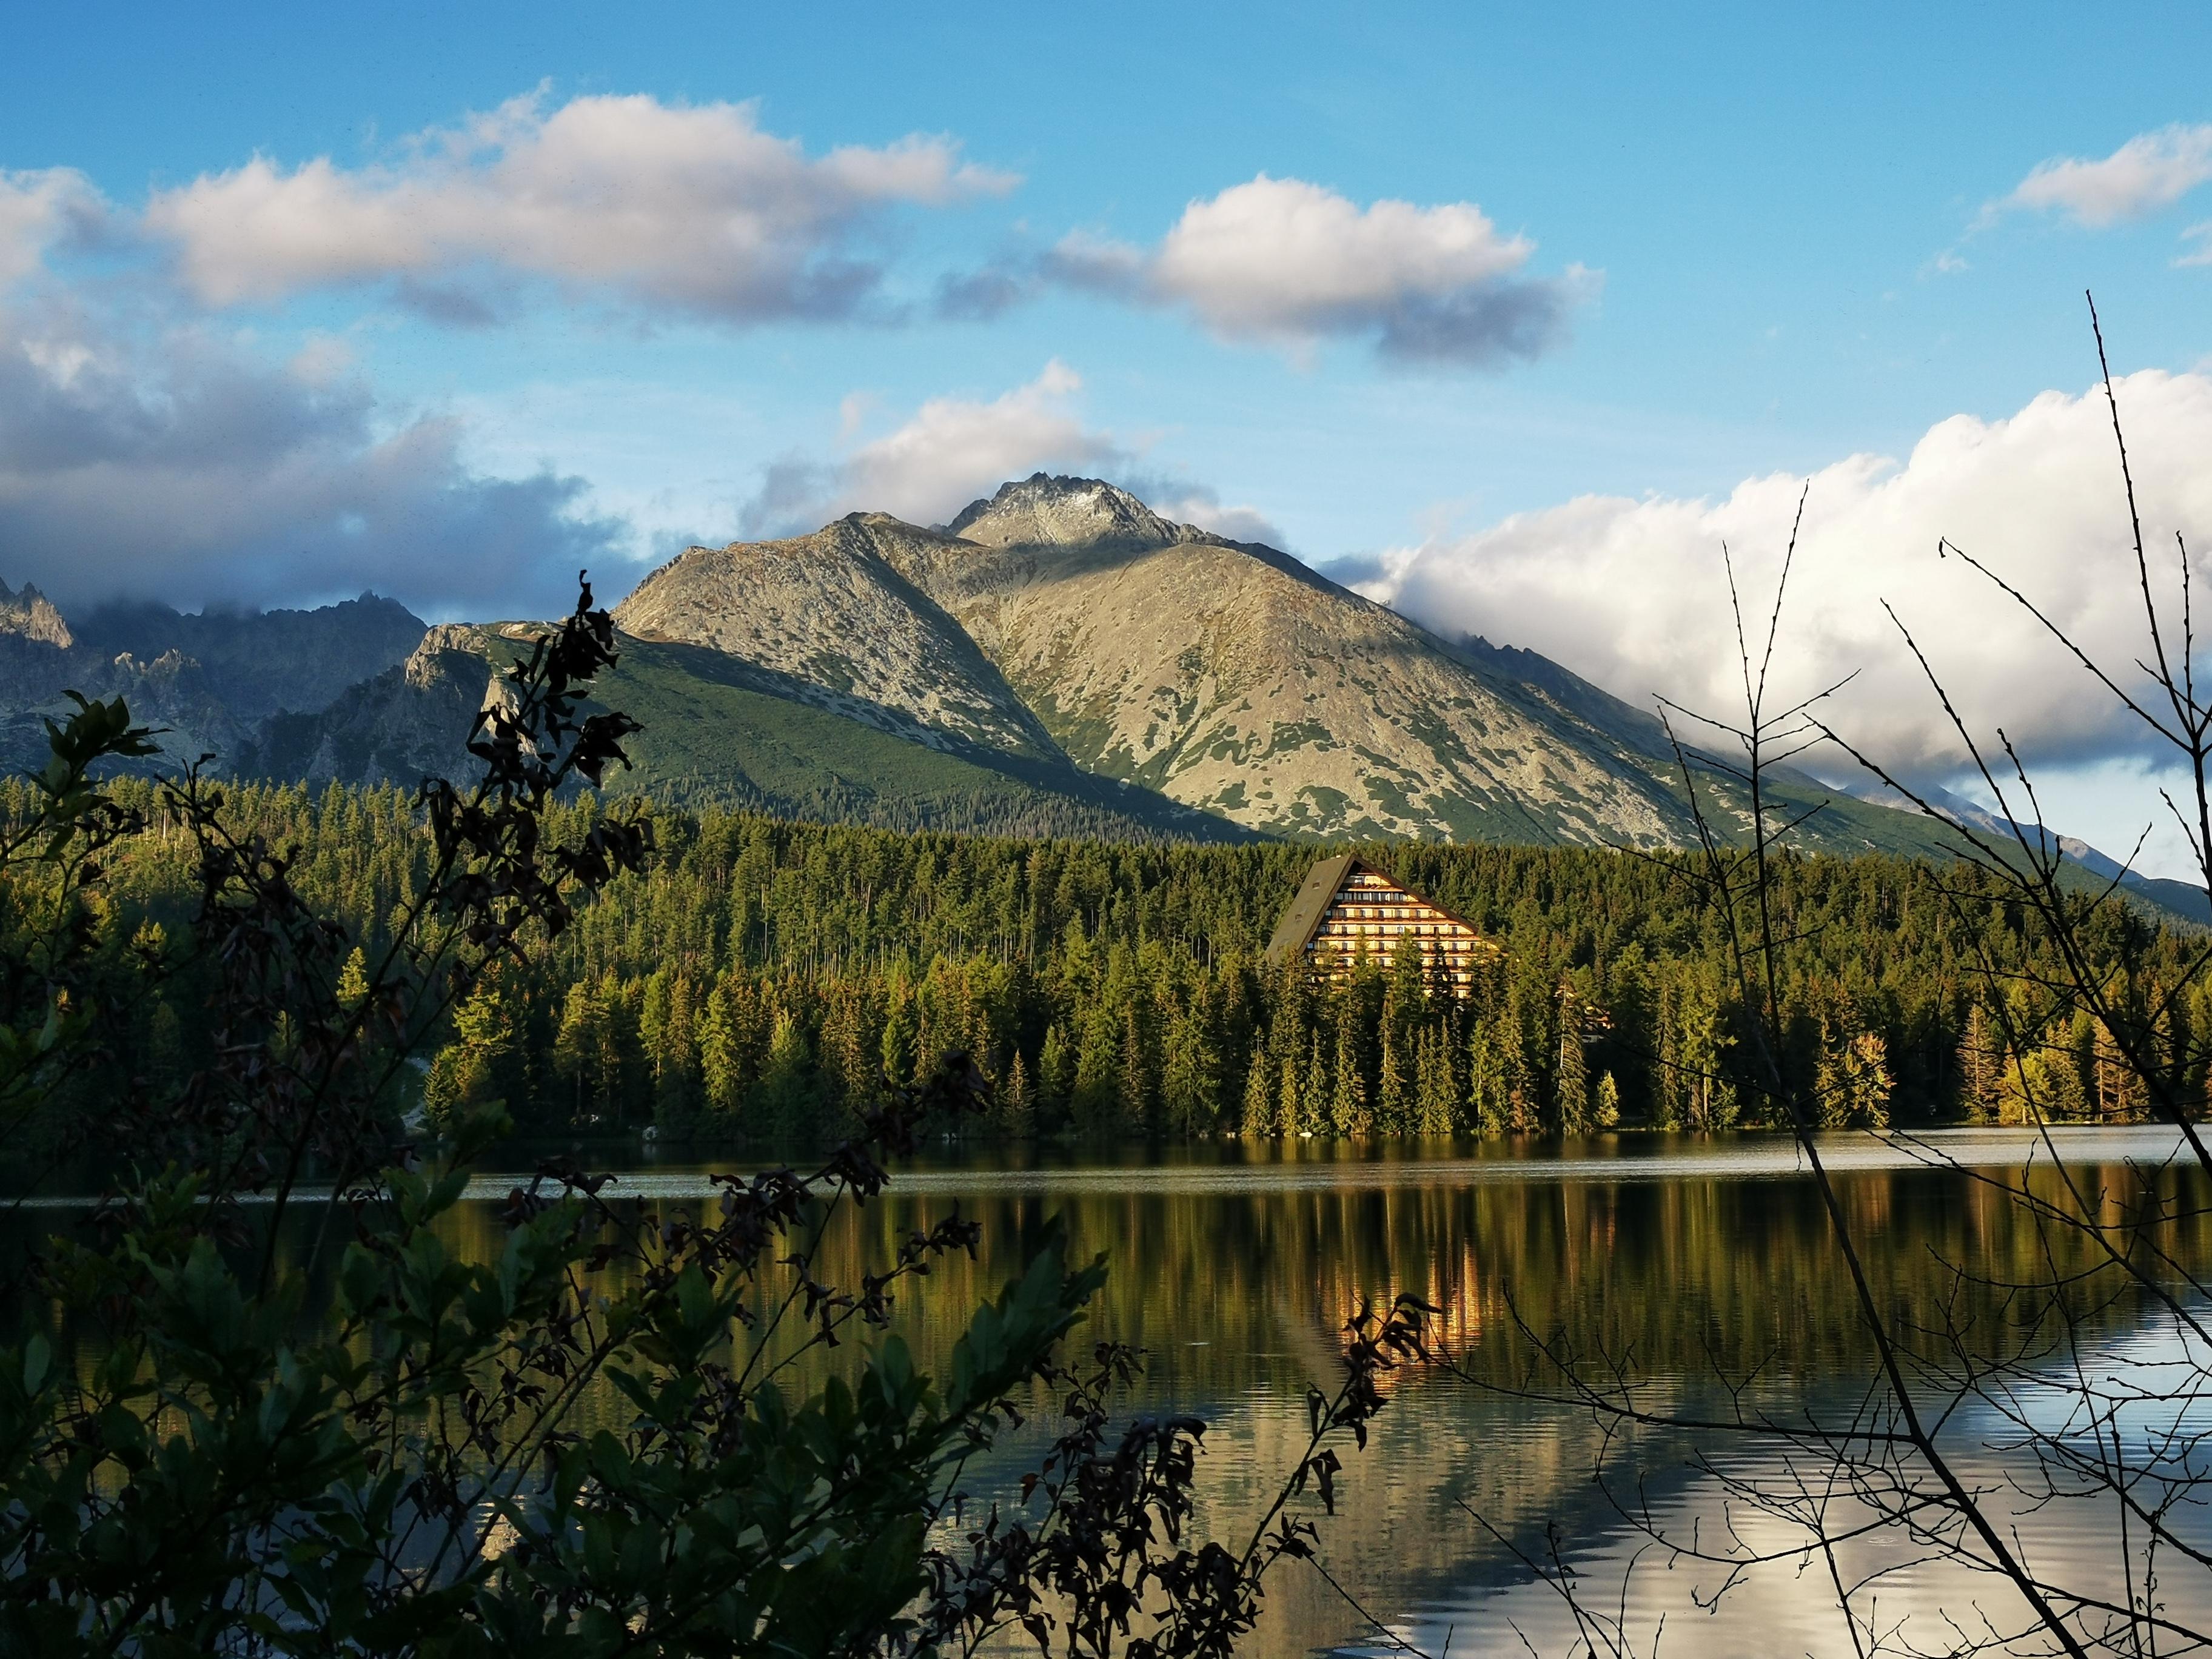 Štrbské pleso is a mountain lake of glacial origin and a top tourist destination in the High Tatras.